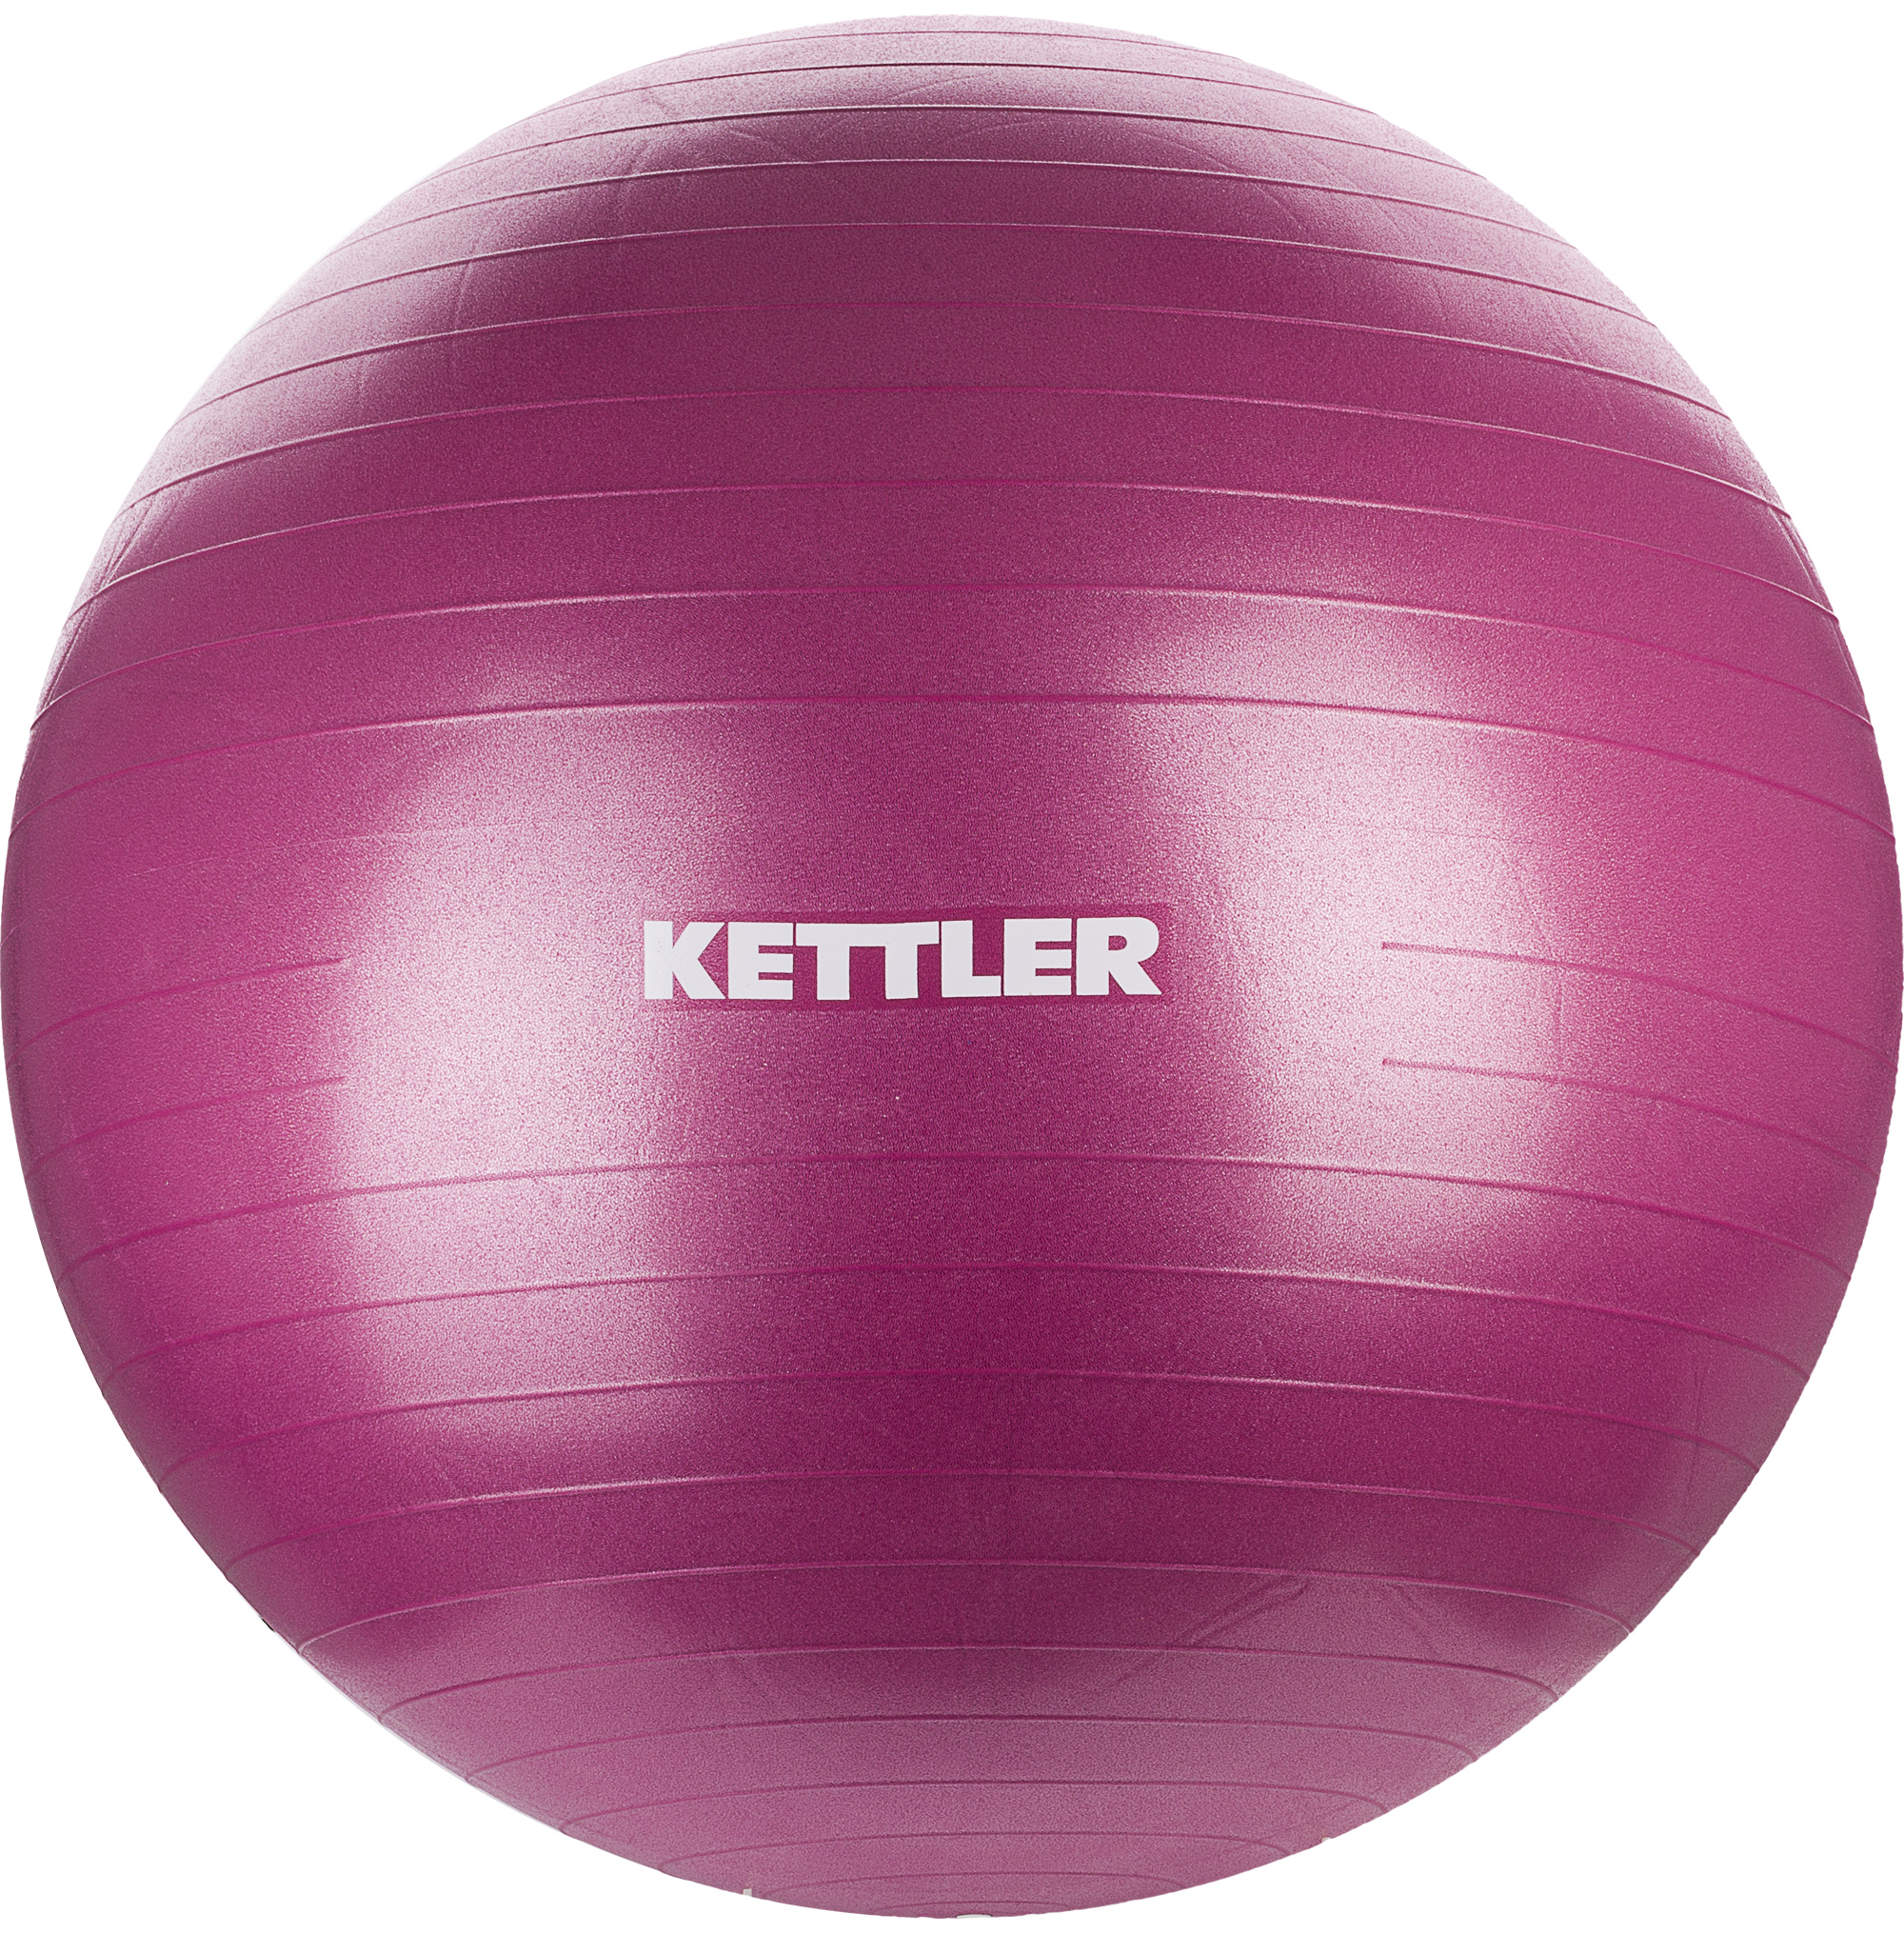 Kettler Мяч гимнастический Kettler, 75 см